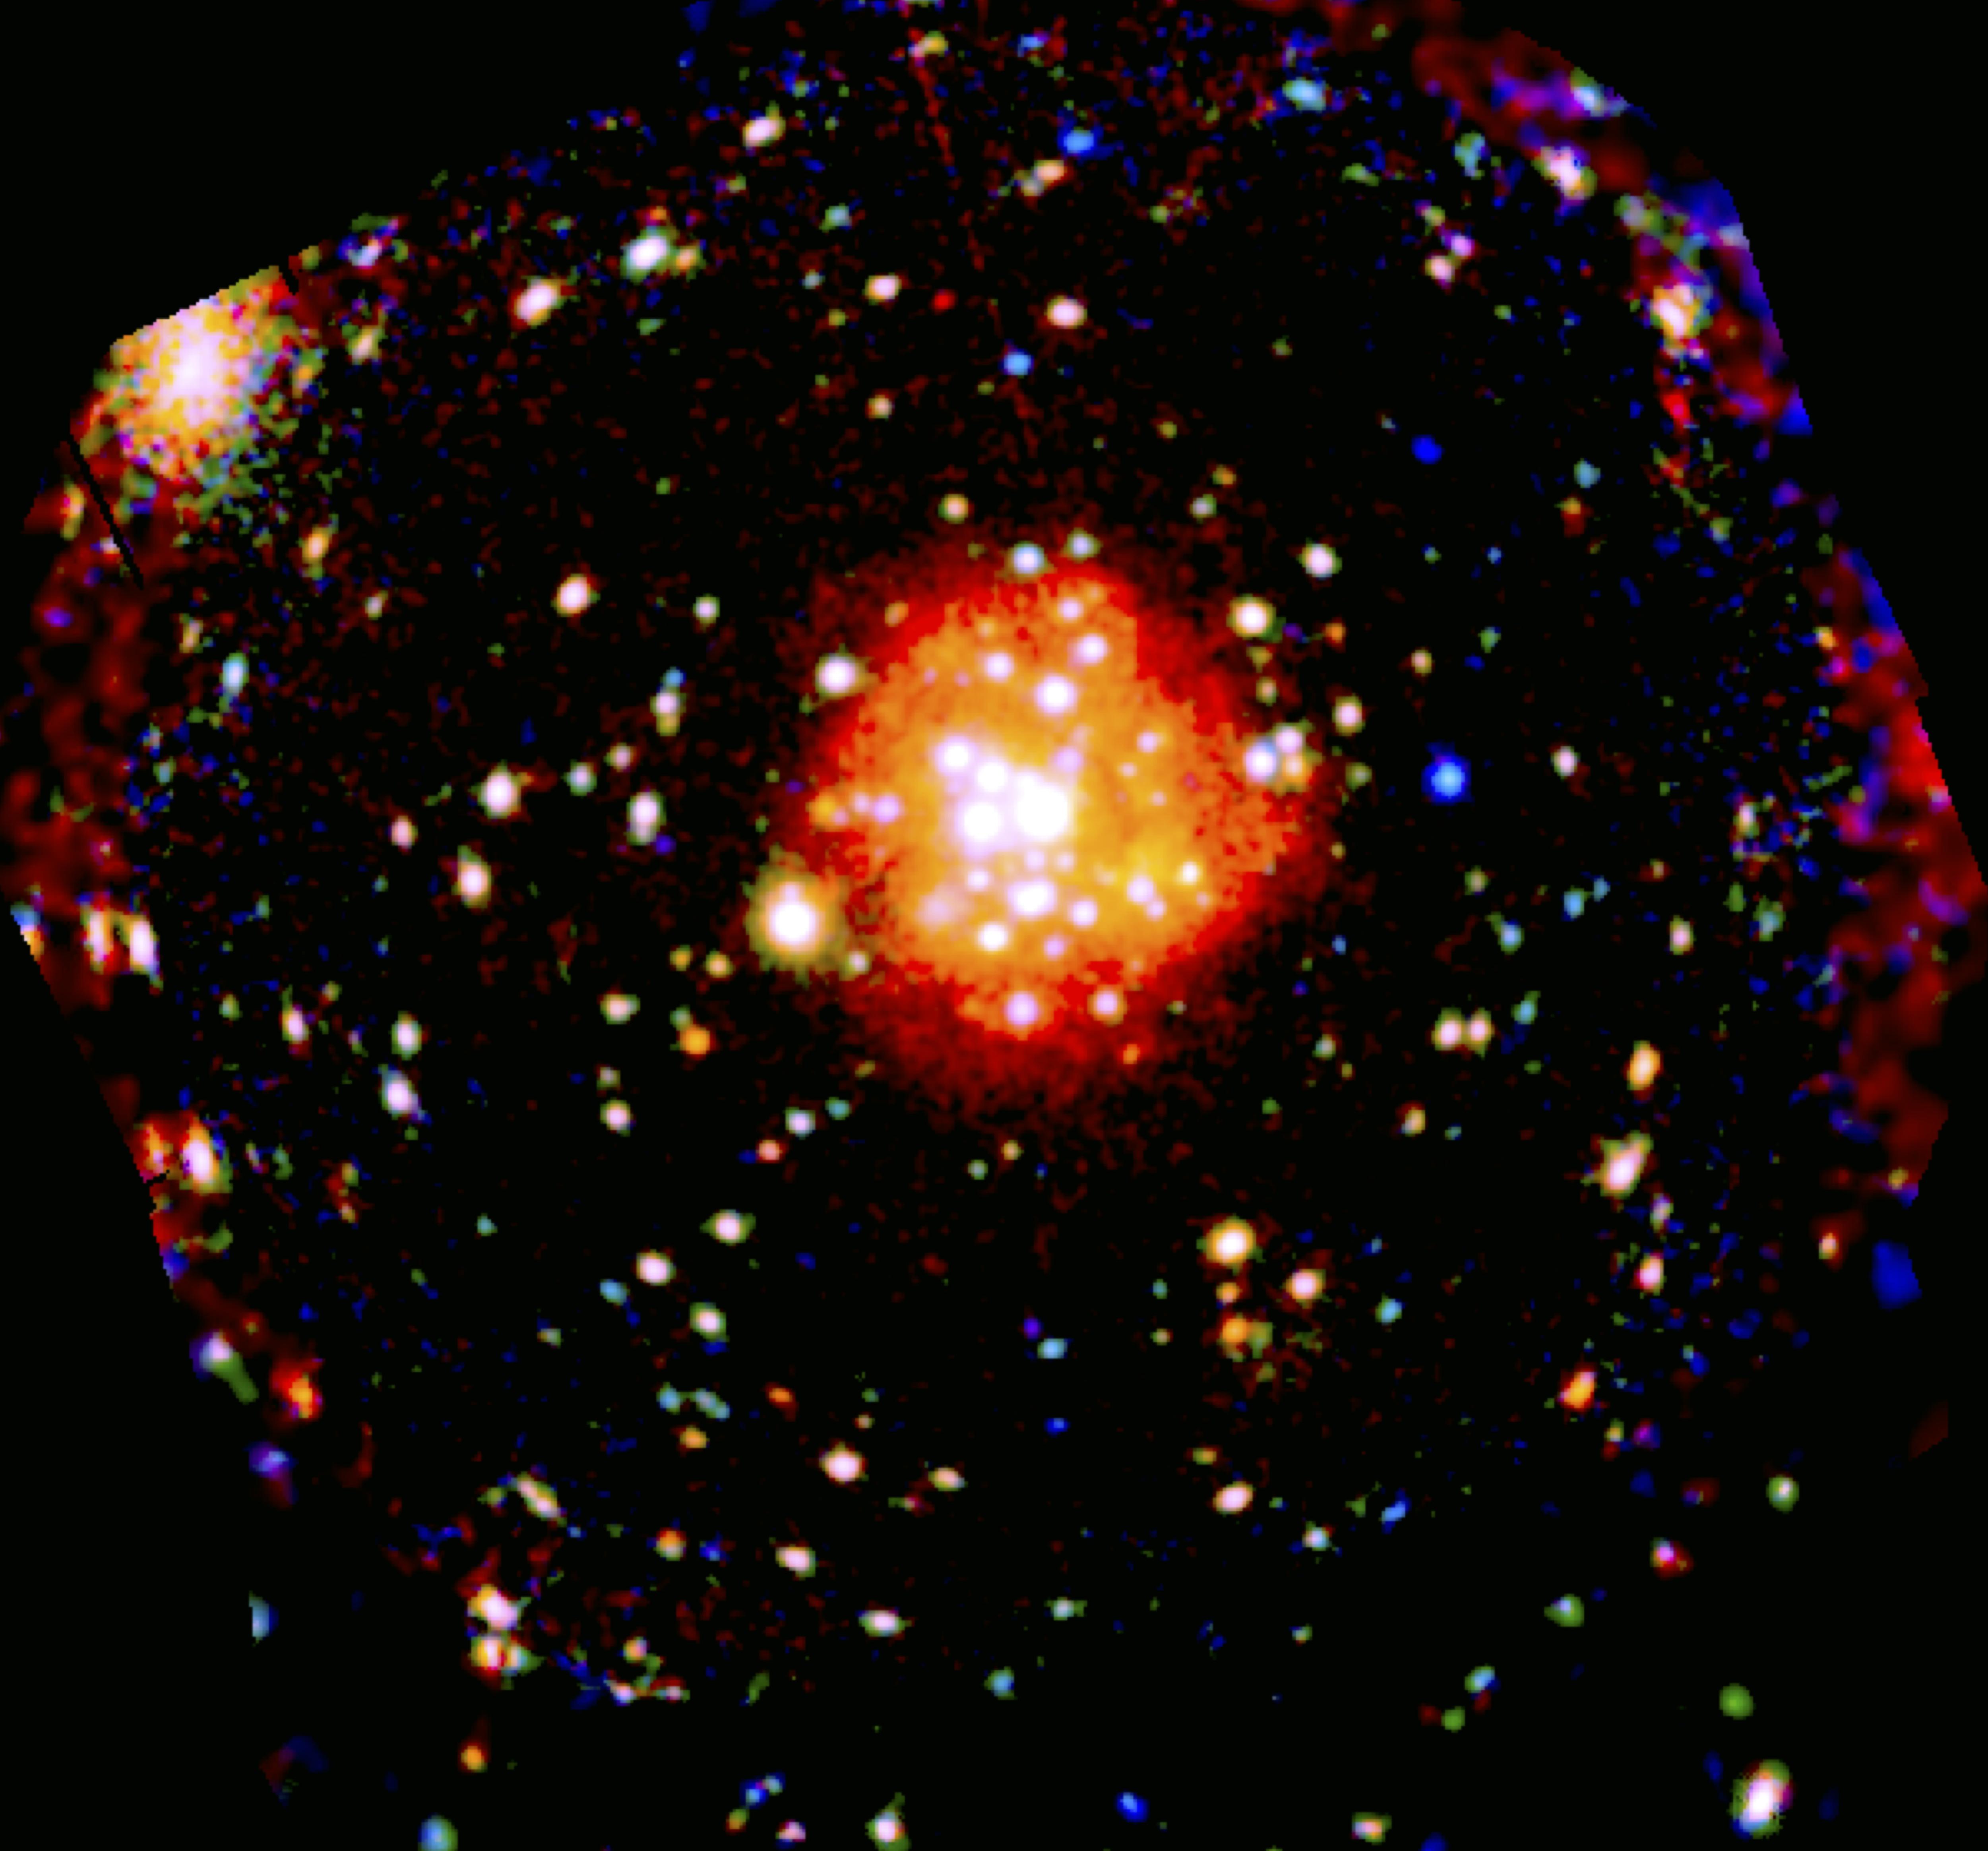 1567214155684-XMM-Newton_M83_X-raying_stellar_remnants.png